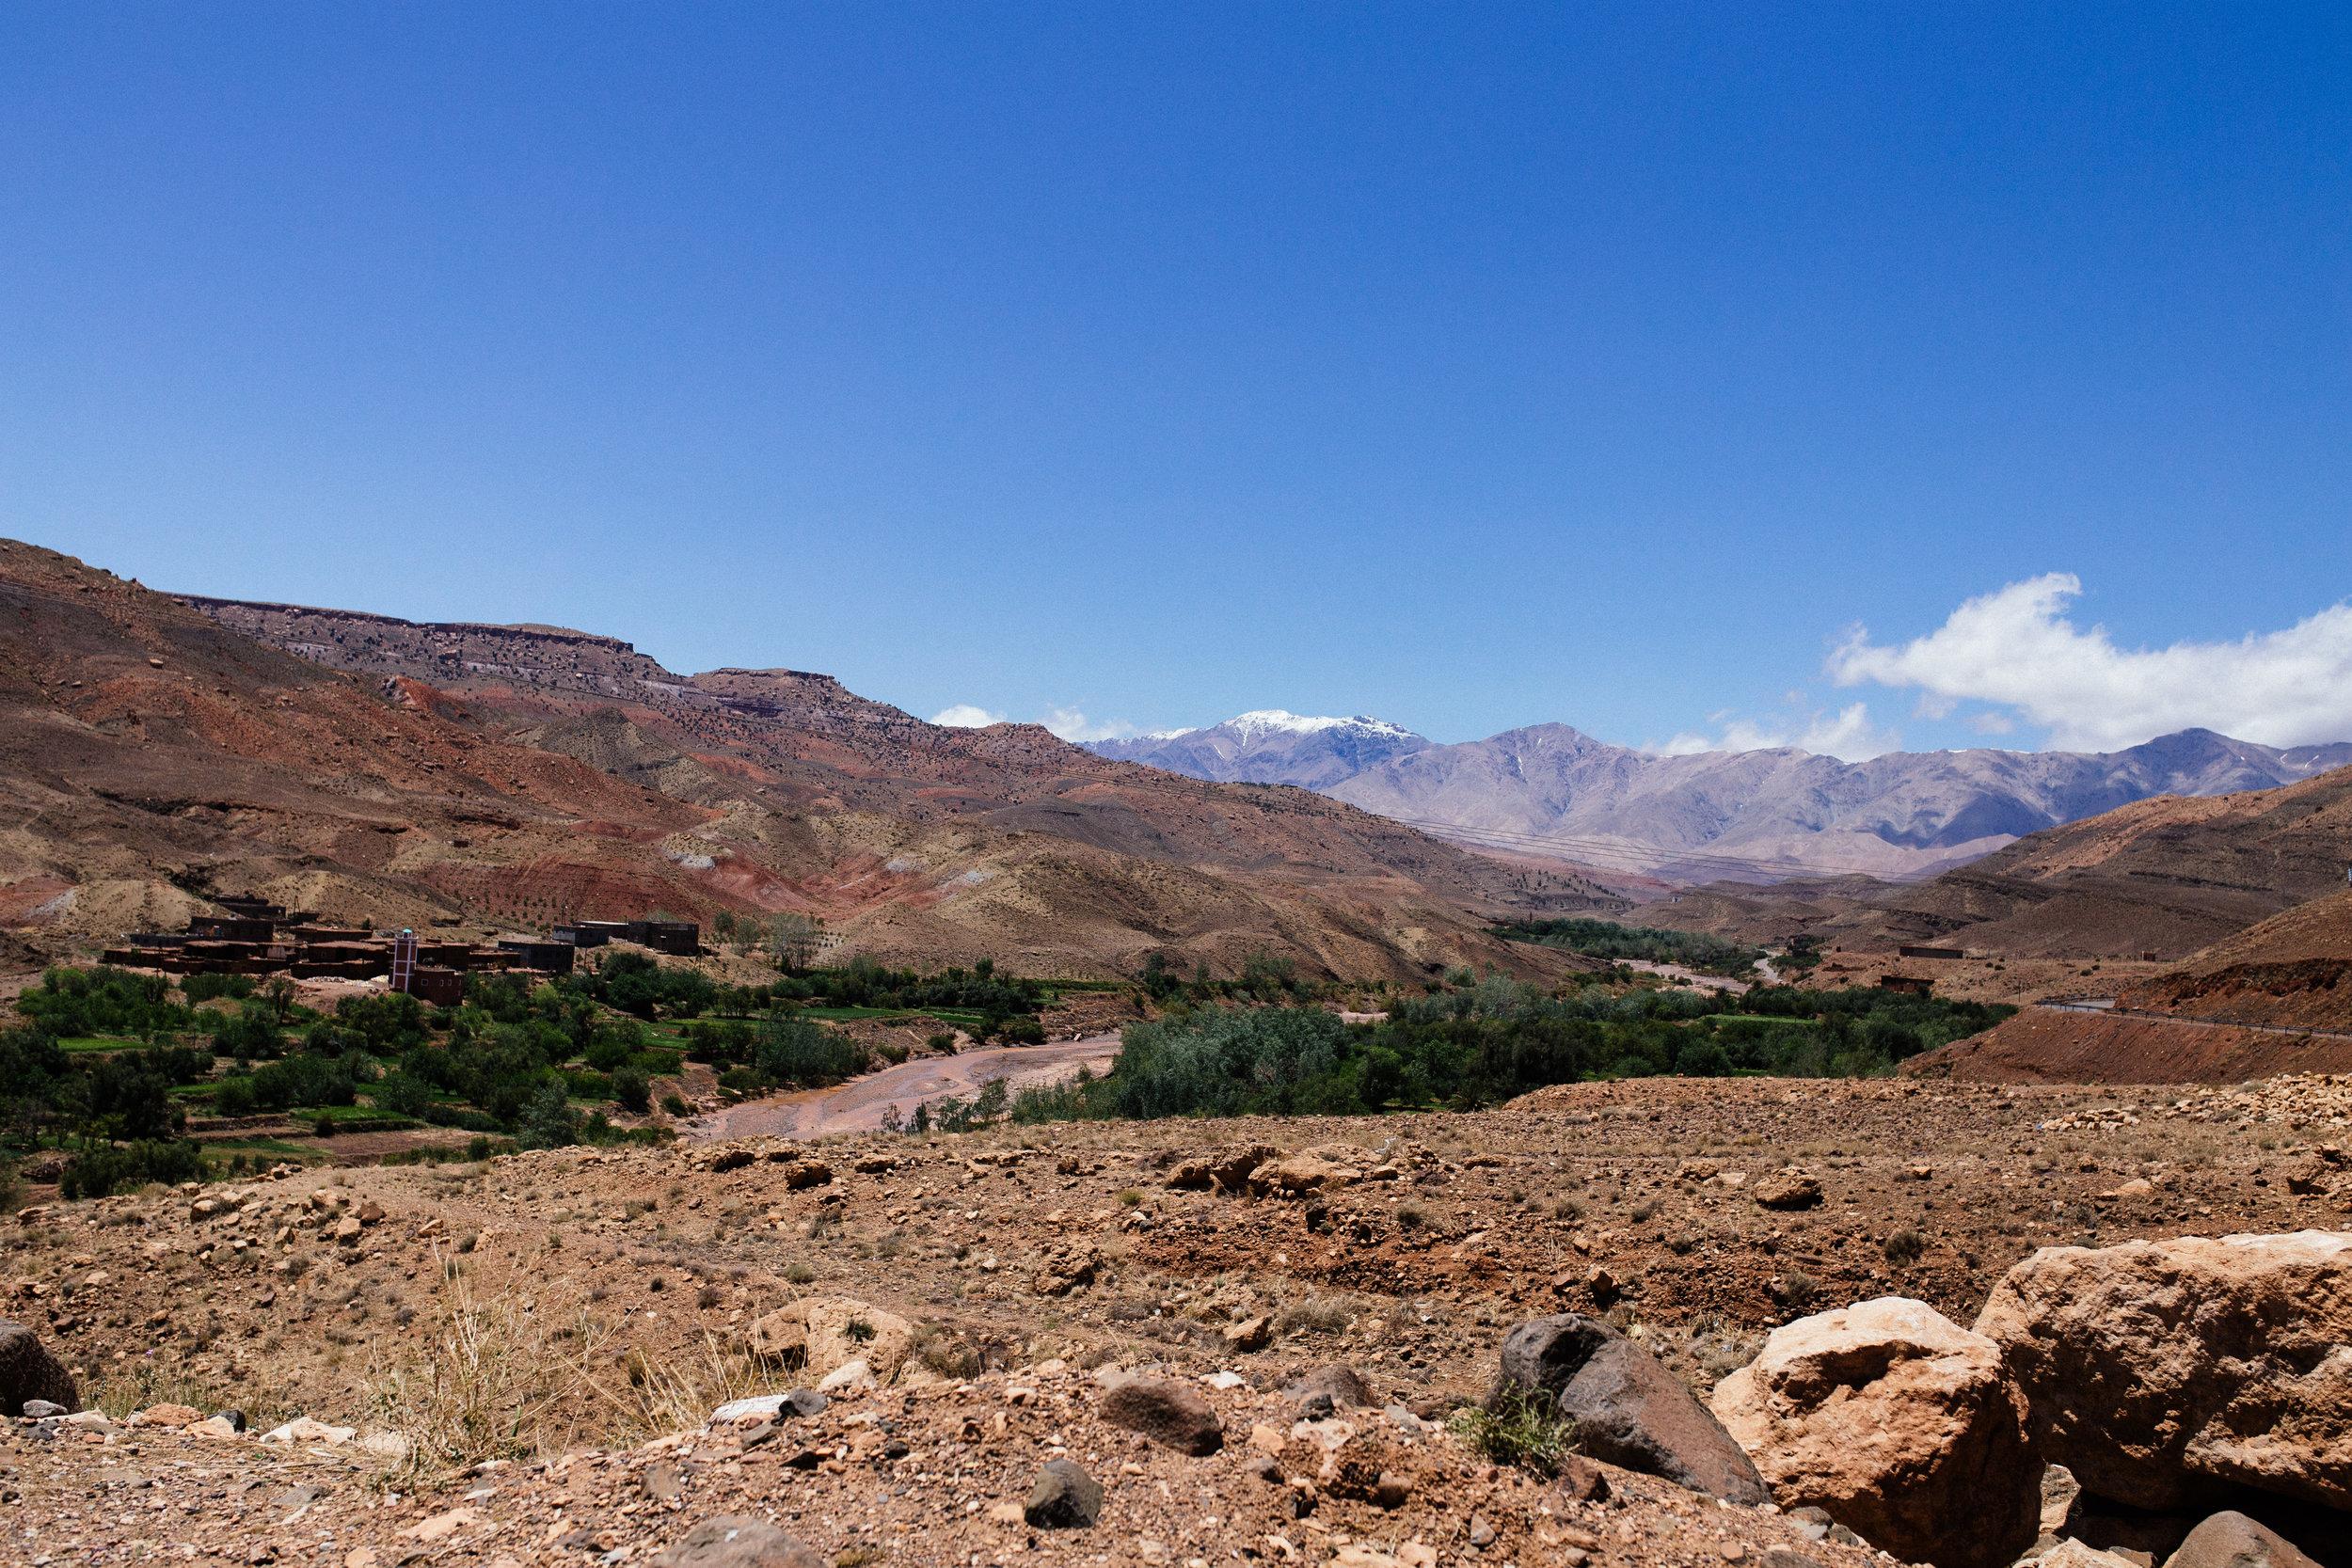 morocco-morocco travel-visit morocco-travel-travel photography-travel photographer-alina mendoza-alina mendoza photography-24.jpg